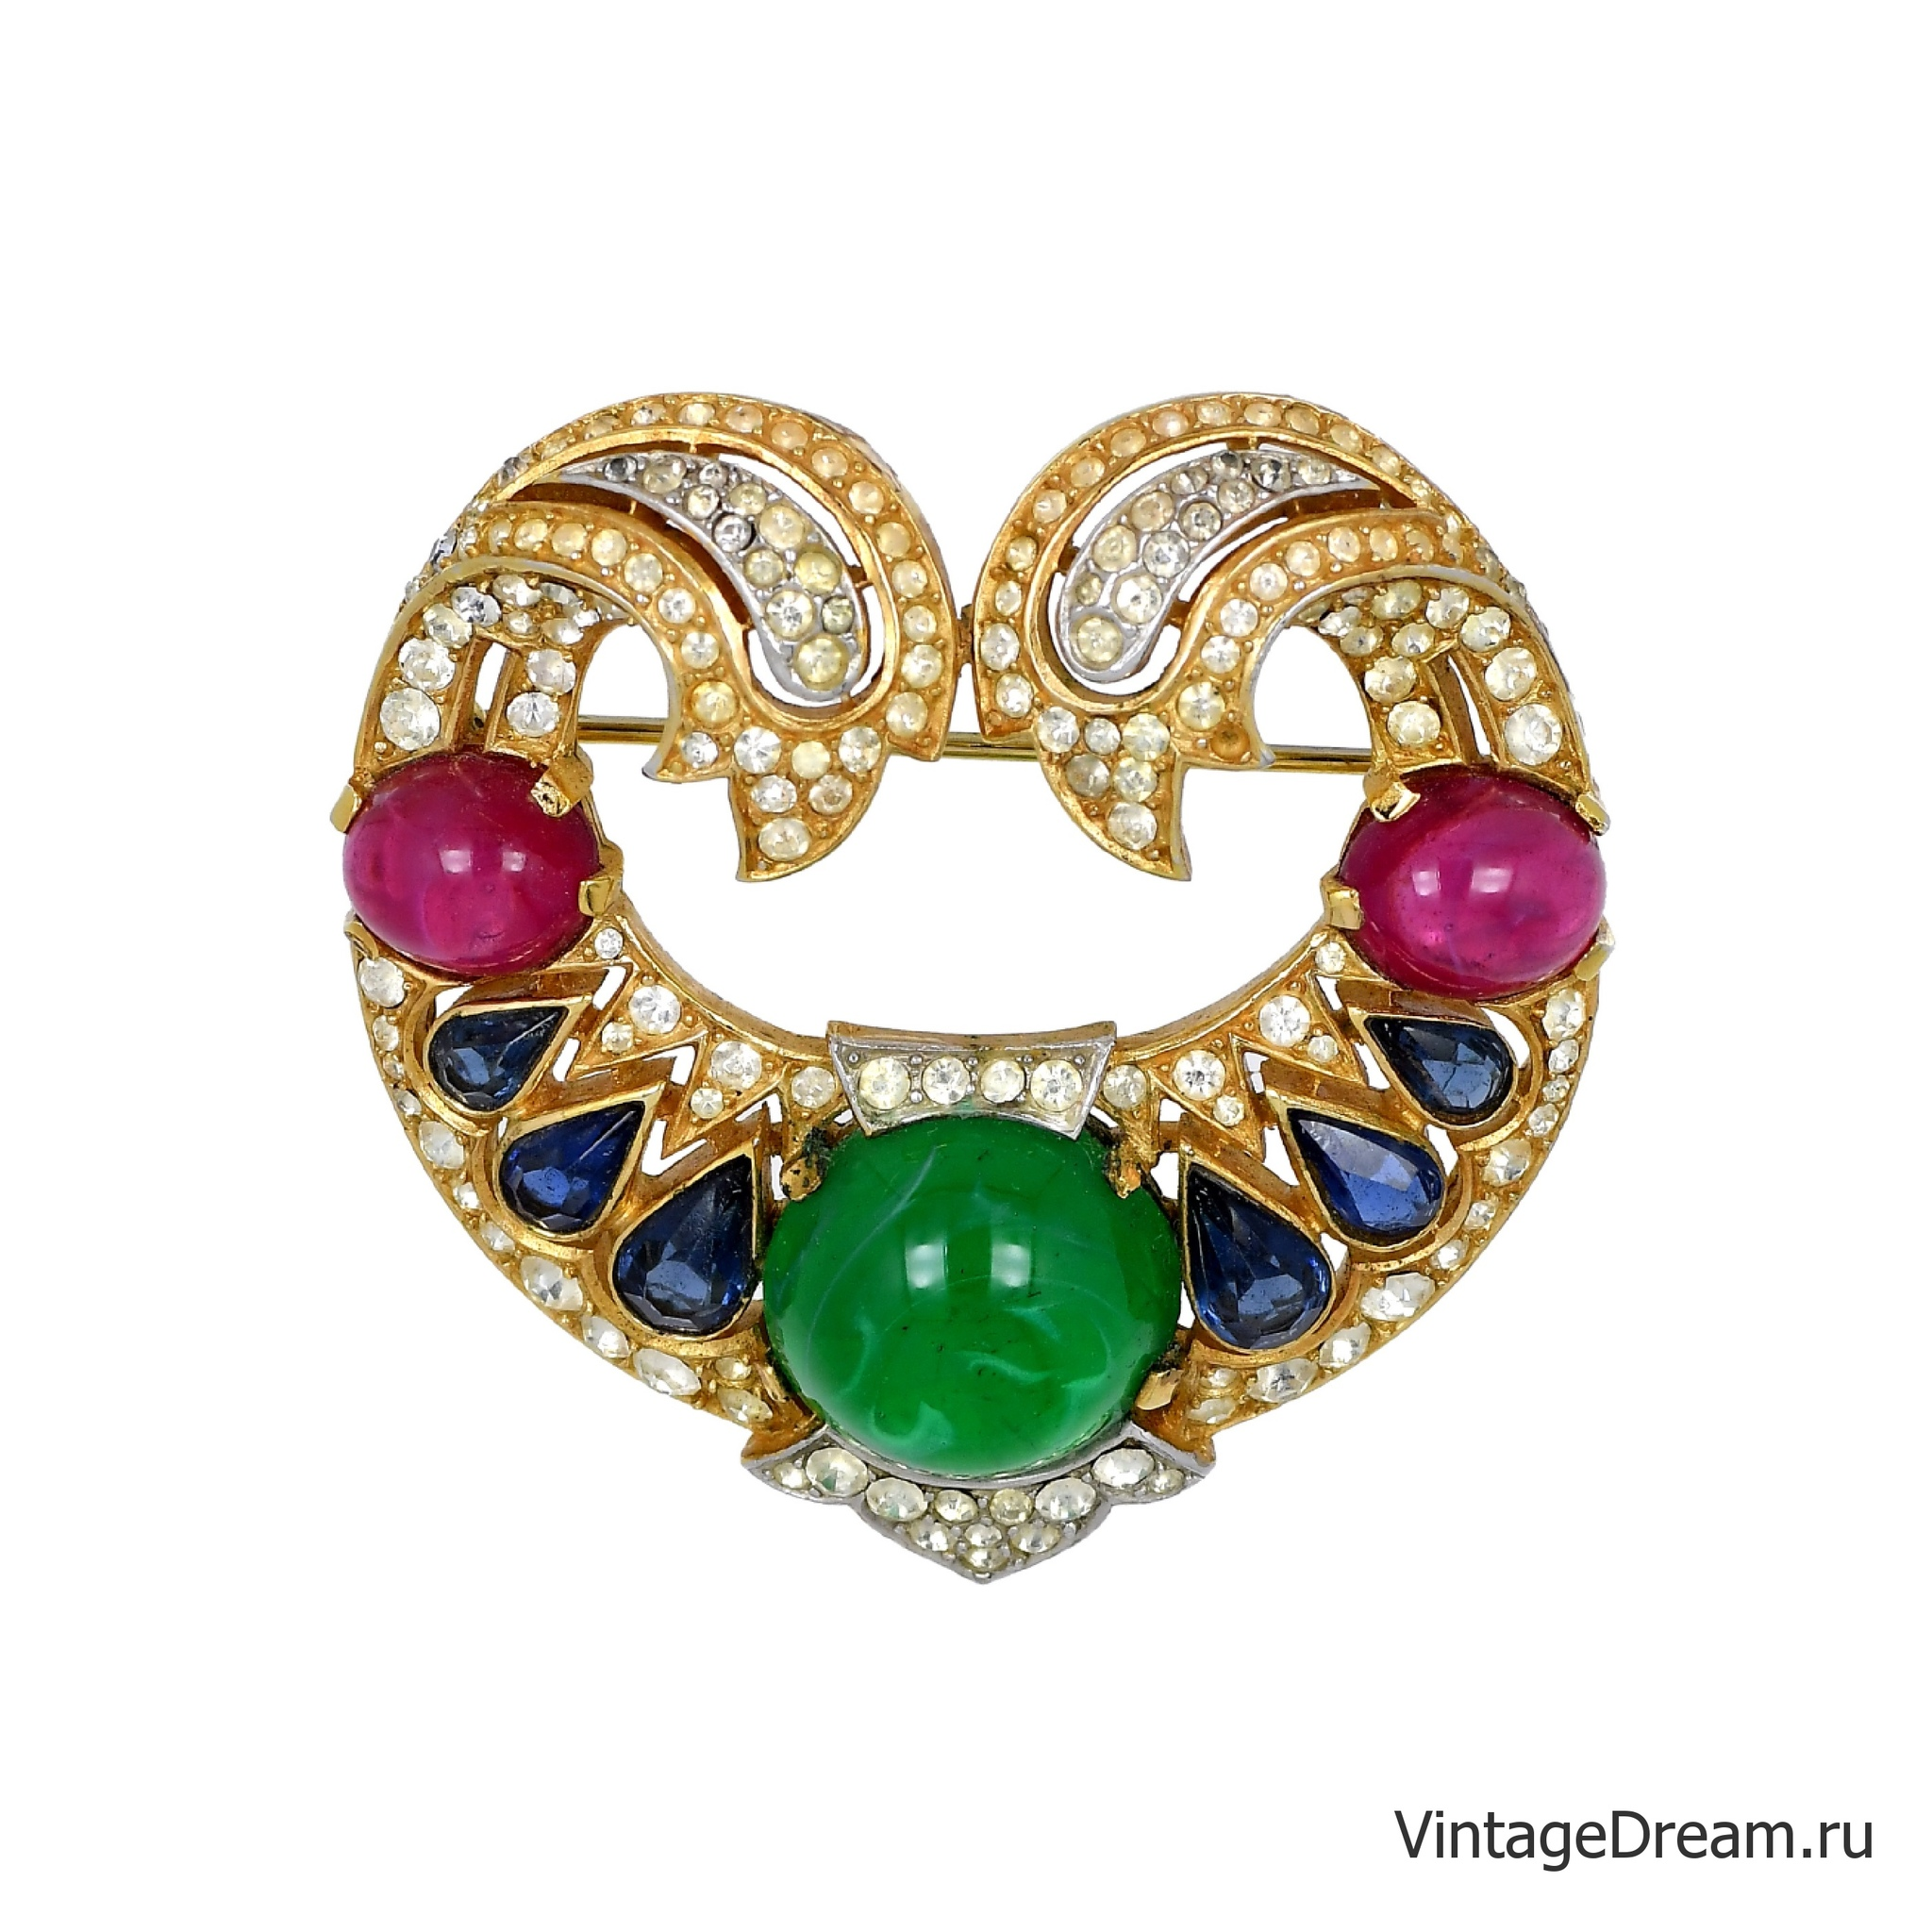 "Брошь от Trifari из коллекции ""The Jewels of India"" 1965 года"